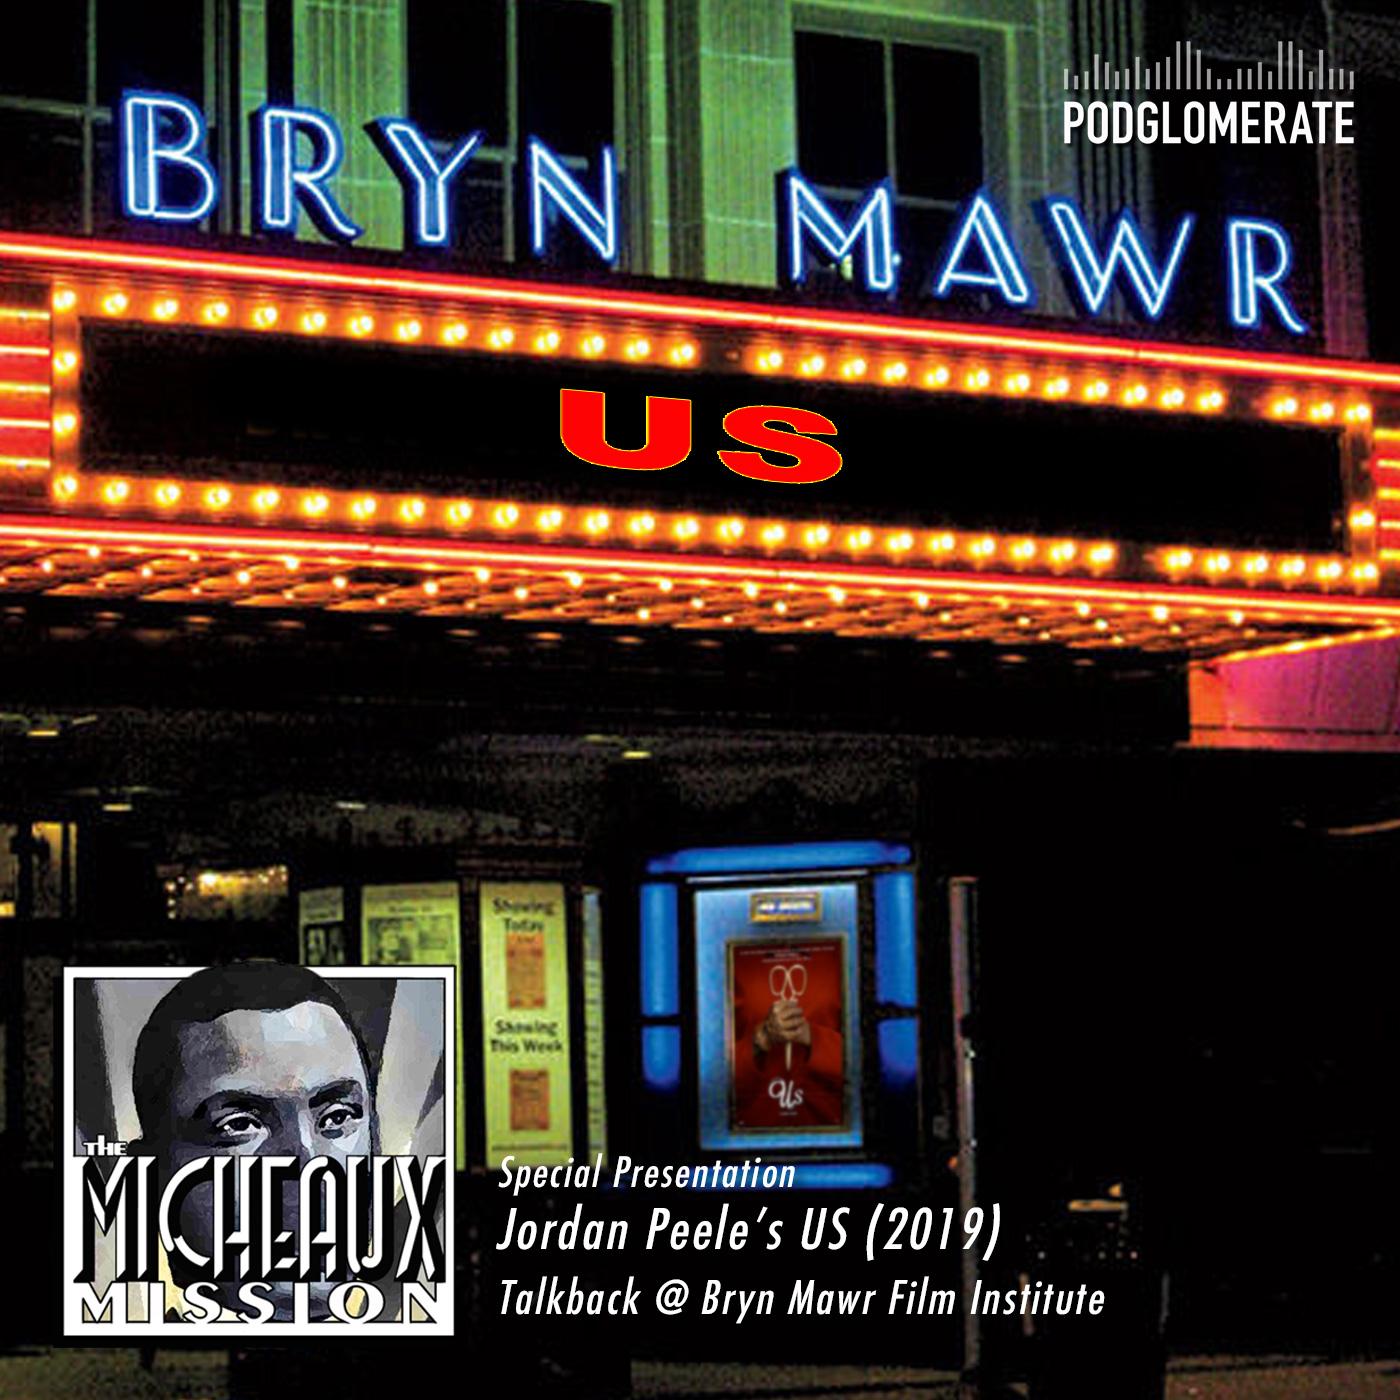 US - A Talkback @ Bryn Mawr Film Institute